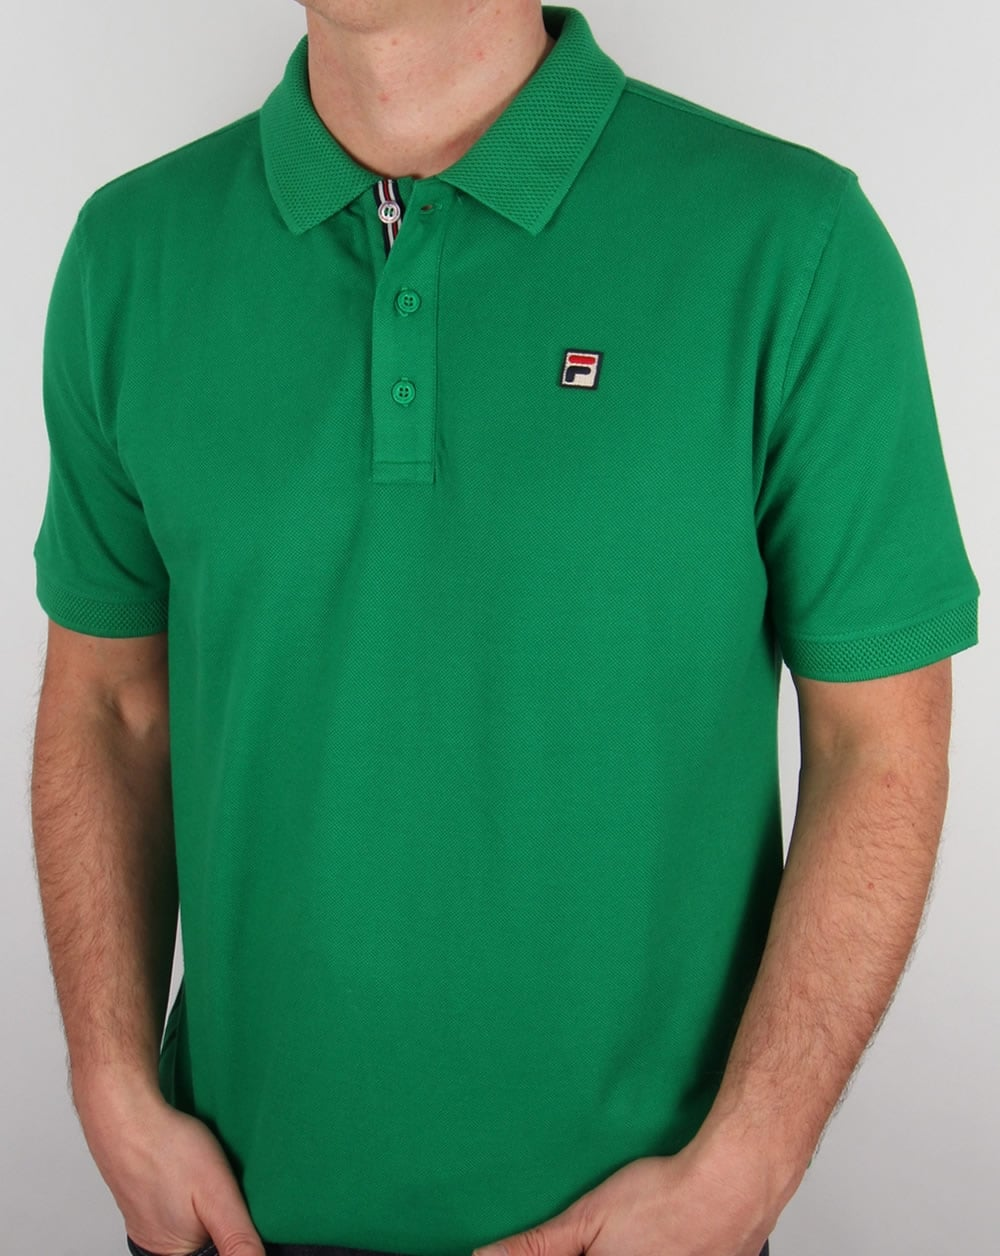 07fc5e0a2 Fila Vintage Brizzi Polo Shirt Kelly Green,cotton,mens,waffle